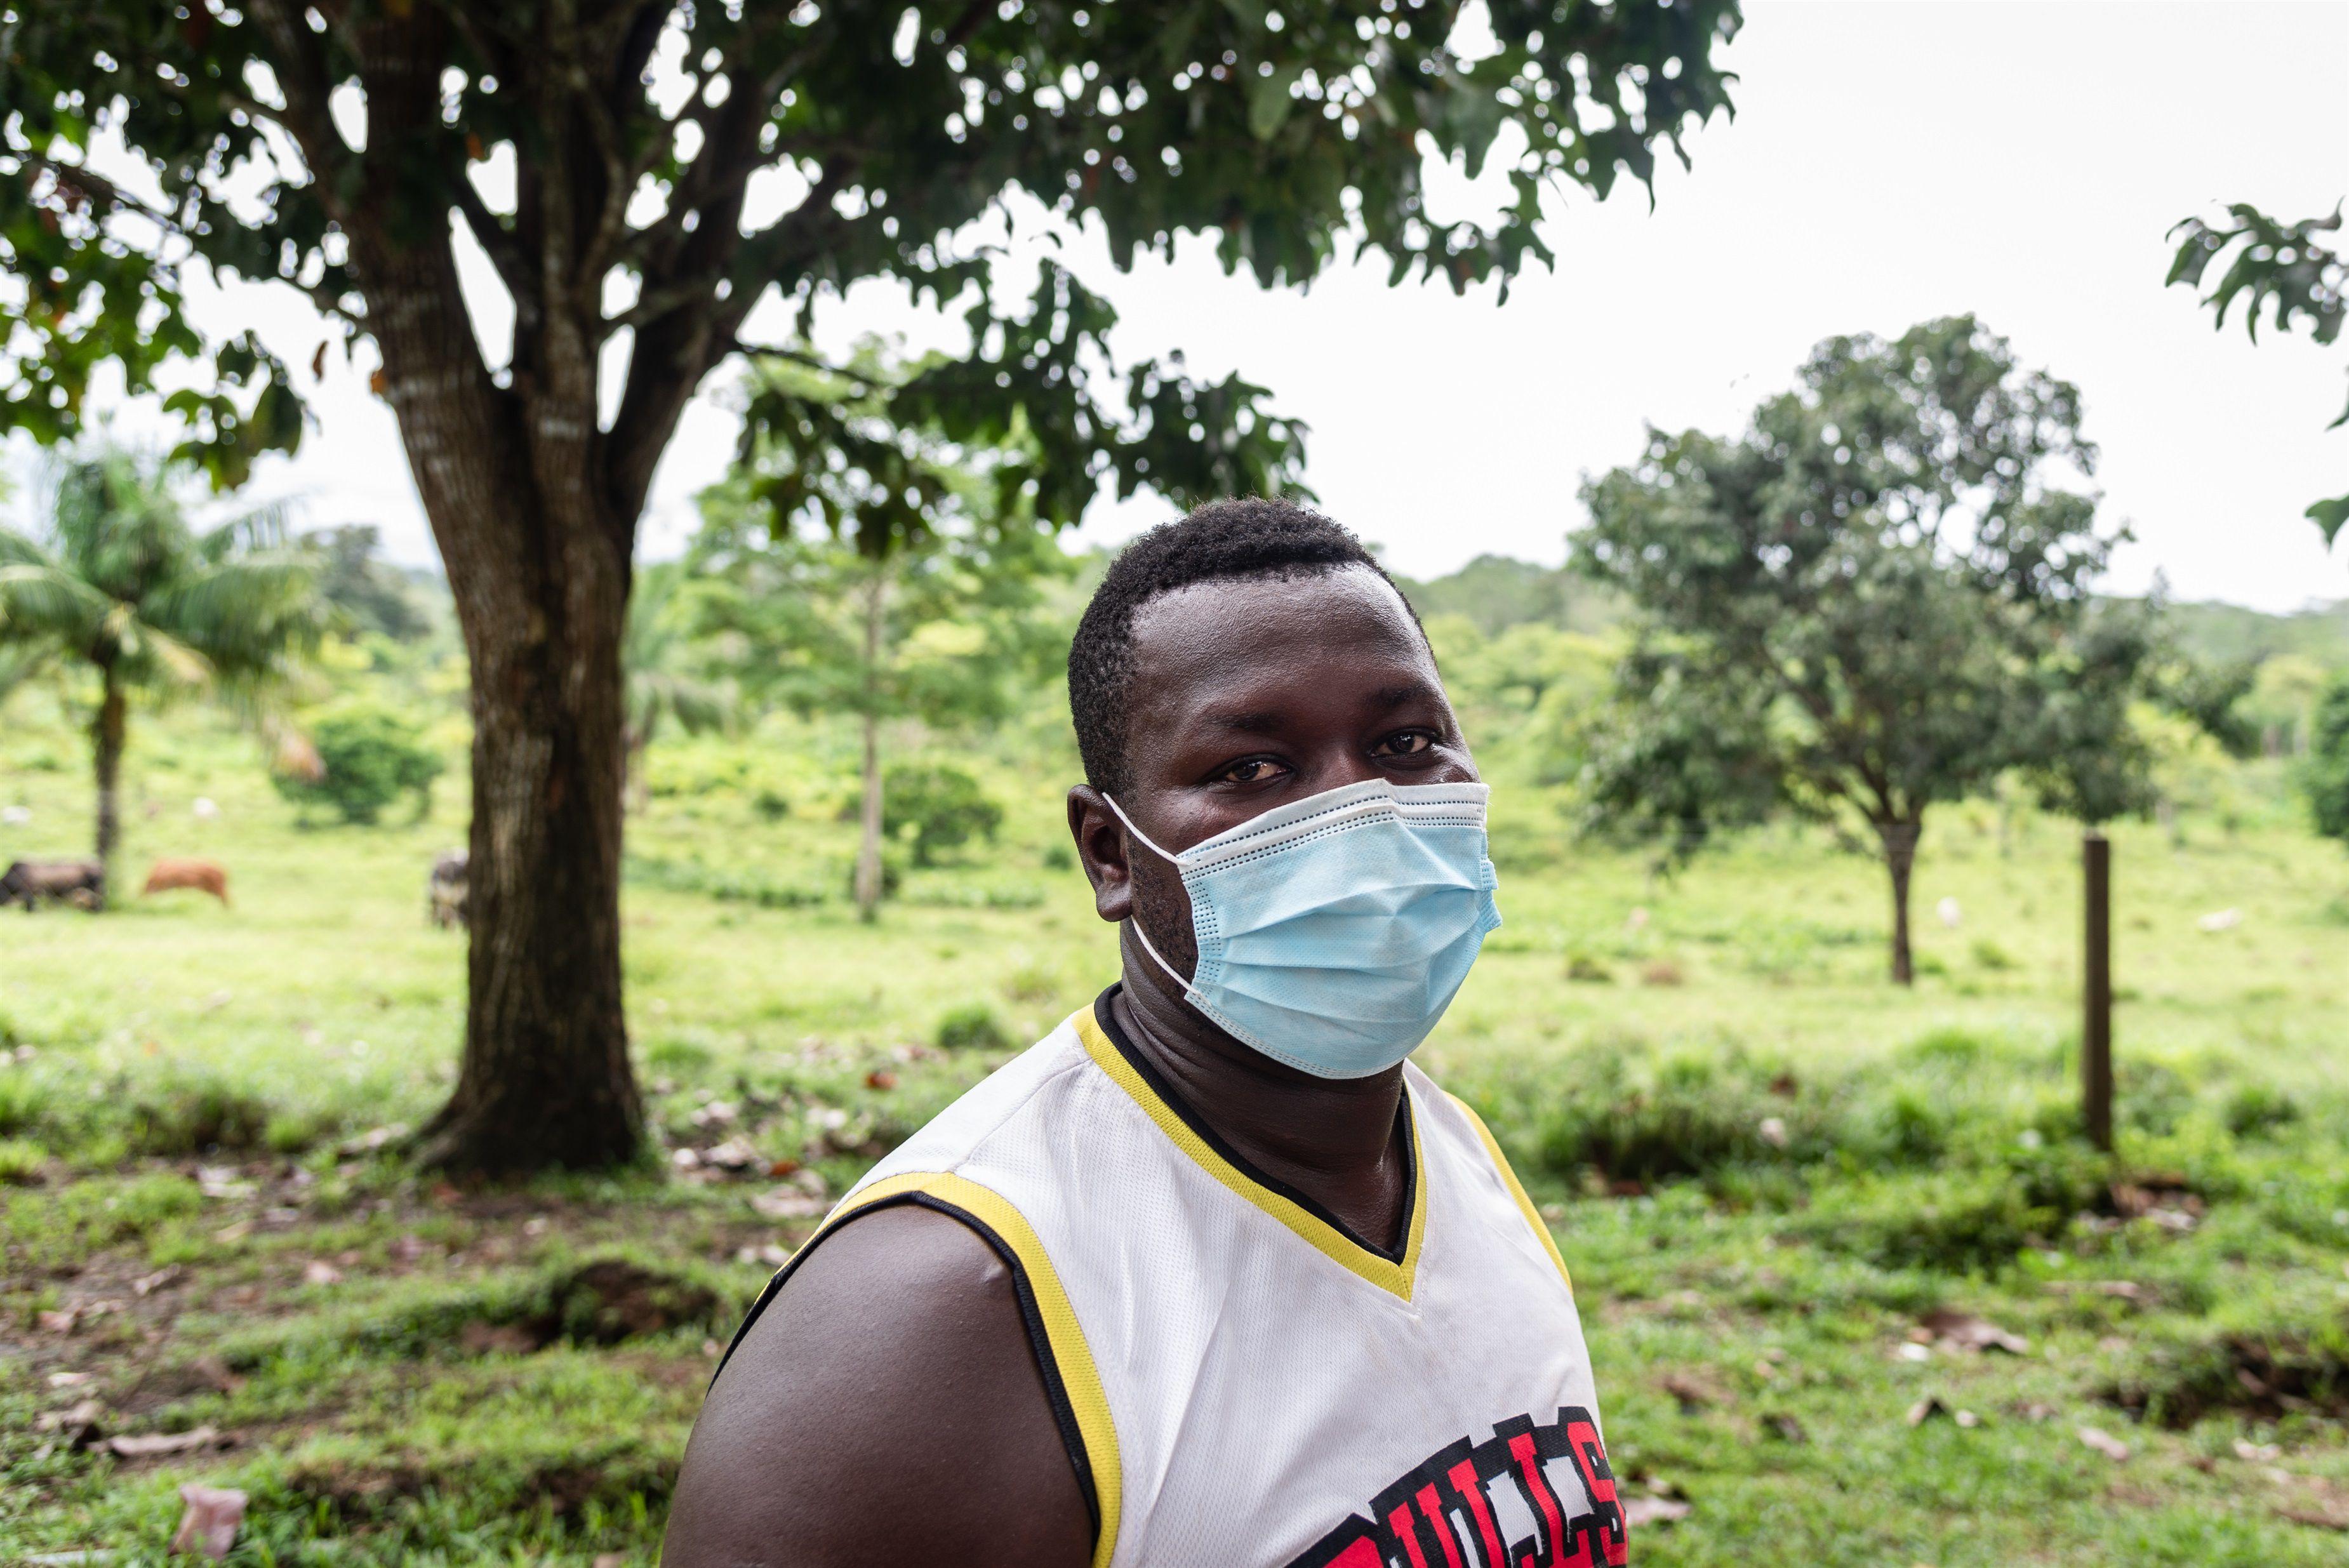 22-09-2021 Crispin 'Toby', migrante haitiano de 30 que cruzó la selva de Darién. POLITICA CENTROAMÉRICA PANAMÁ INTERNACIONAL LATINOAMÉRICA CRUZ ROJA